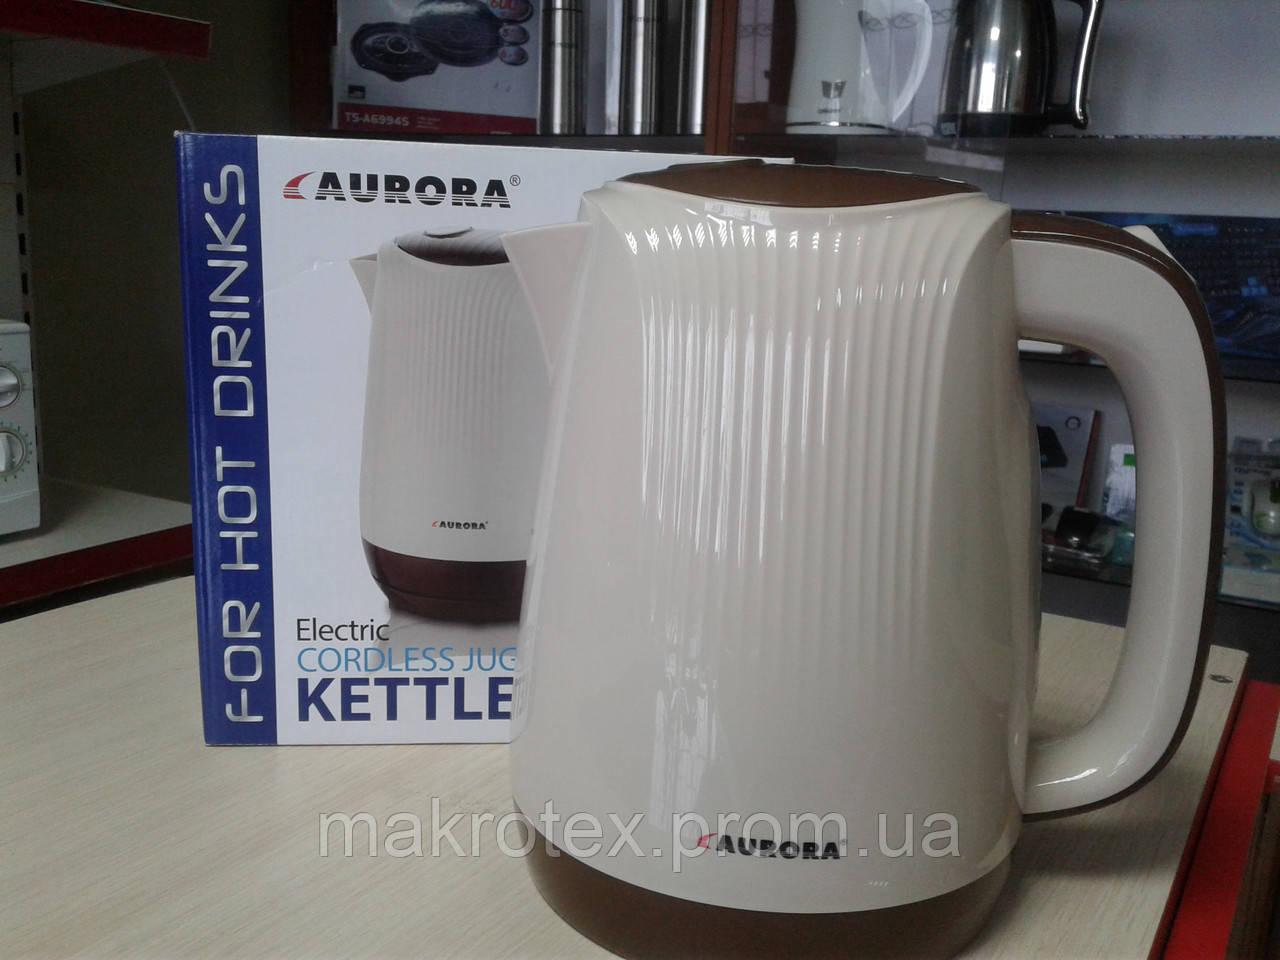 Электрочайник Aurora AU 3506